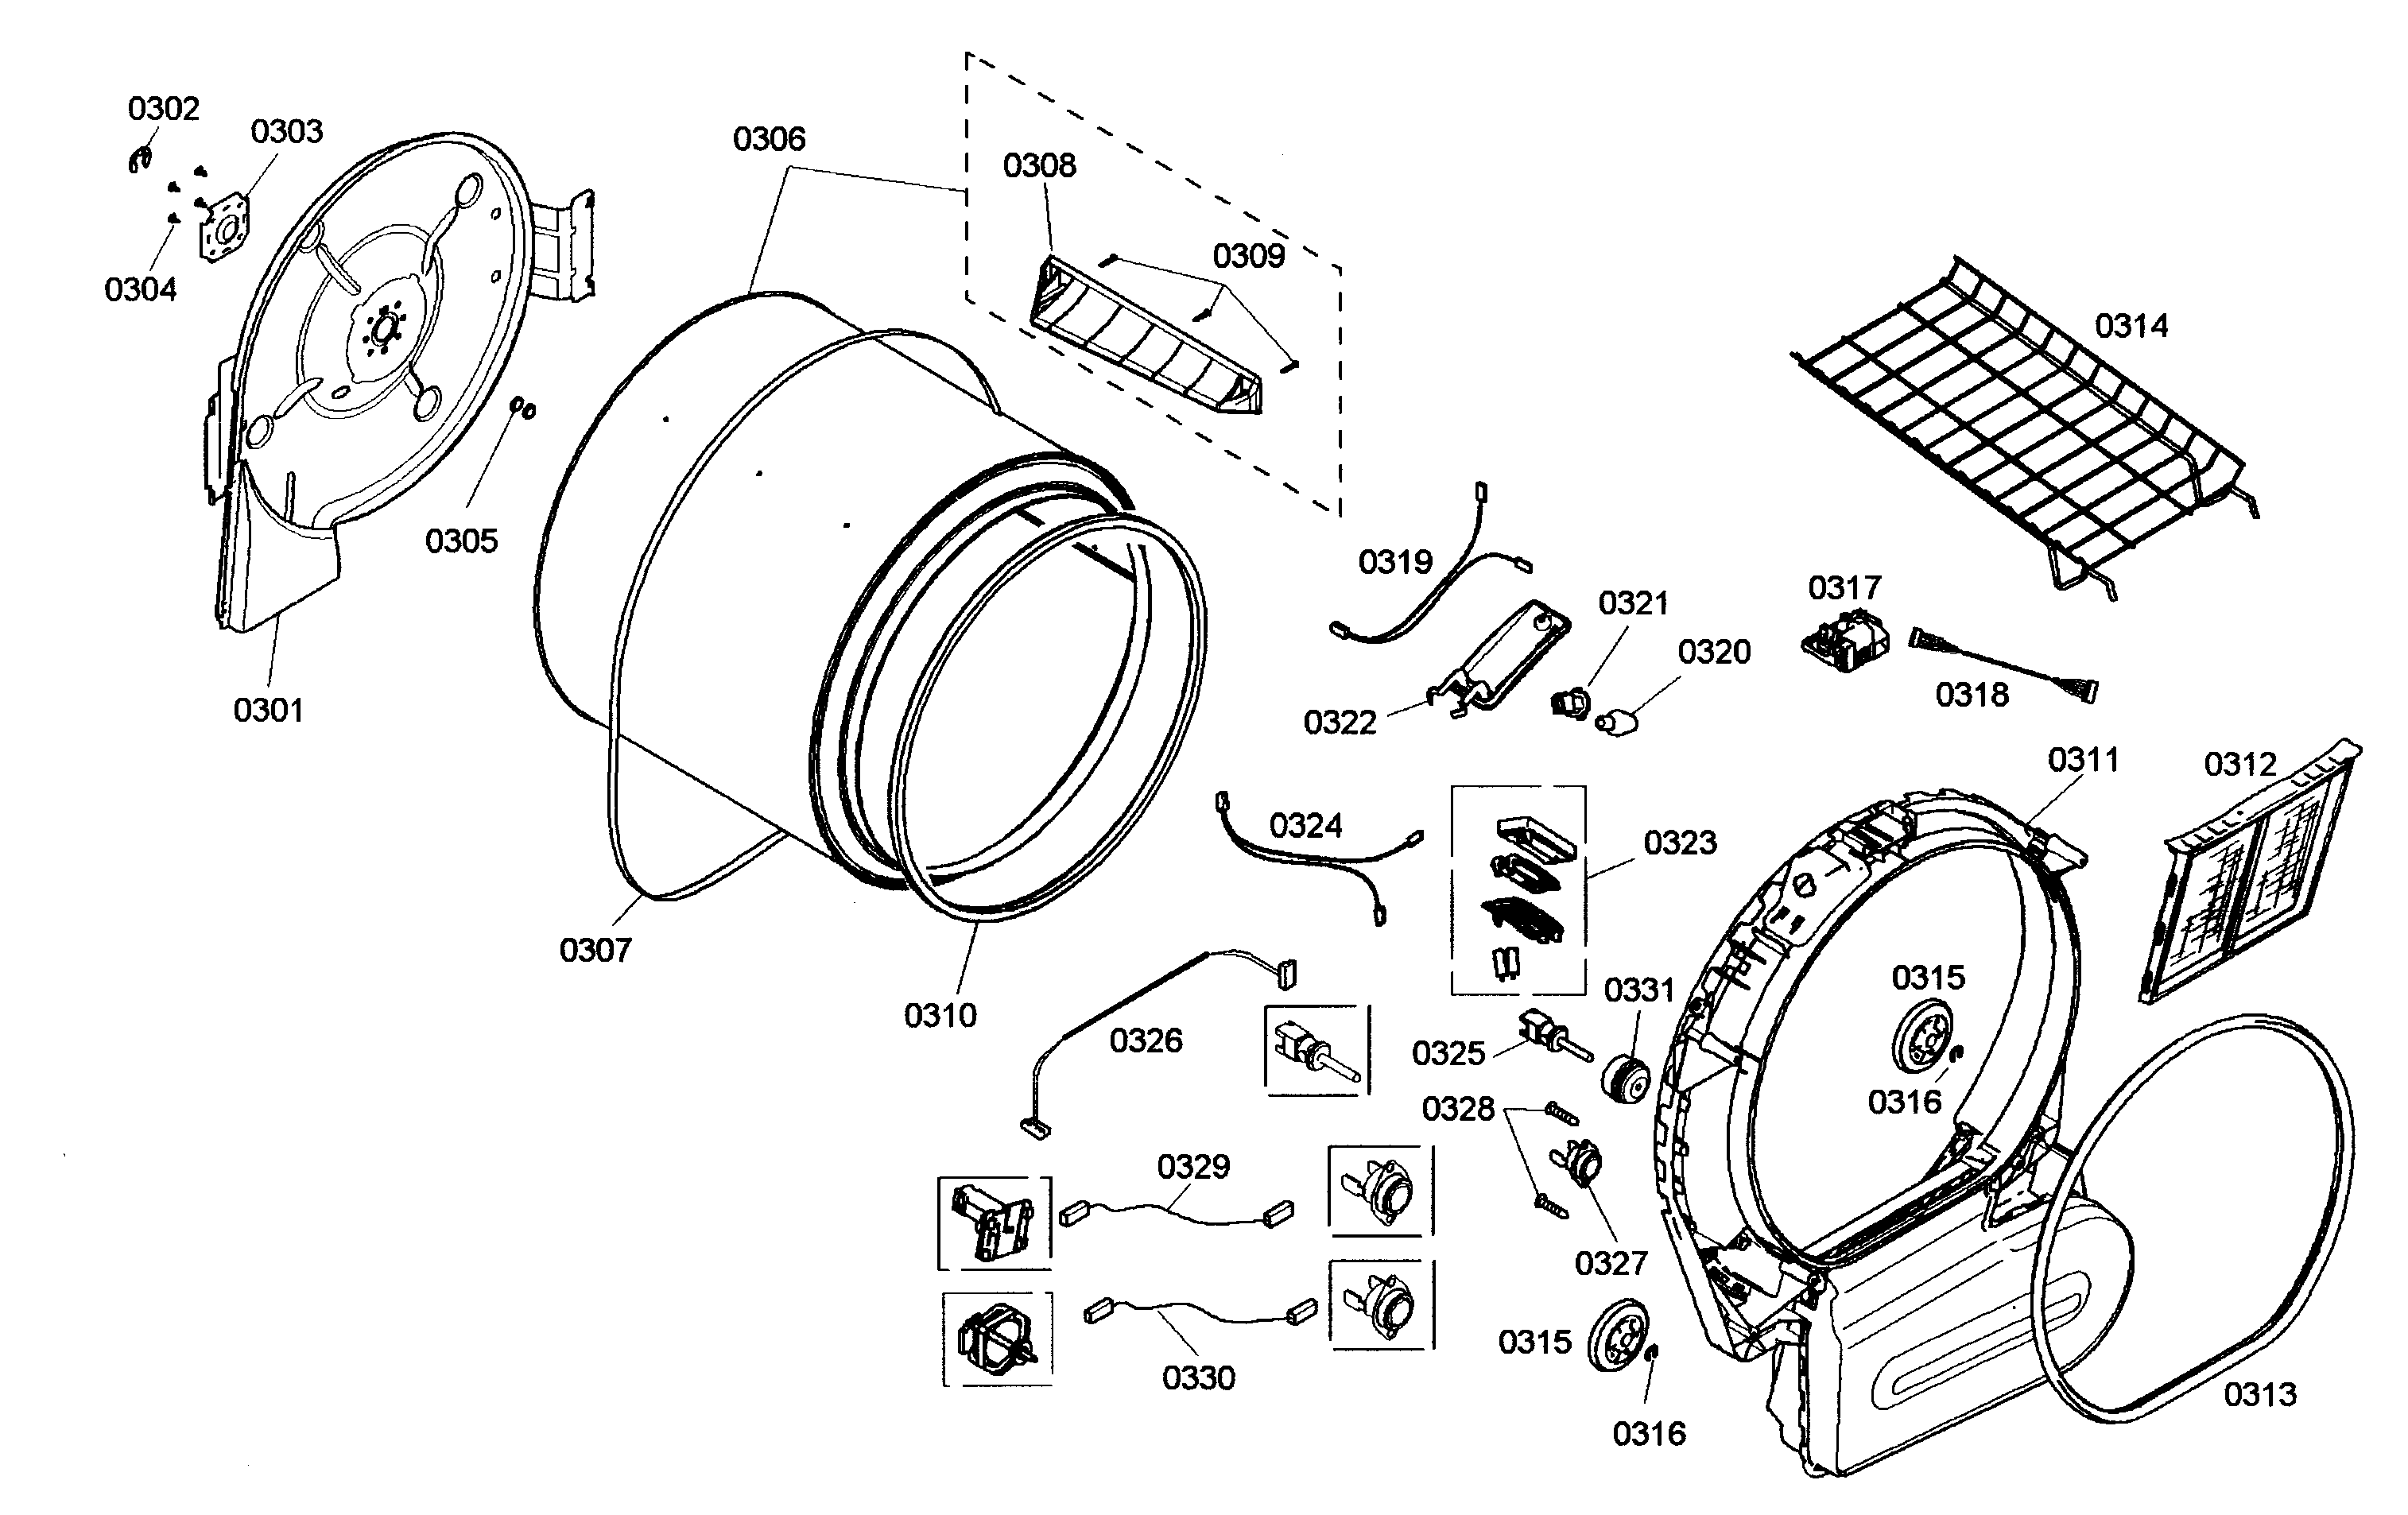 Bosch nexxt 500 series dryer repair manual